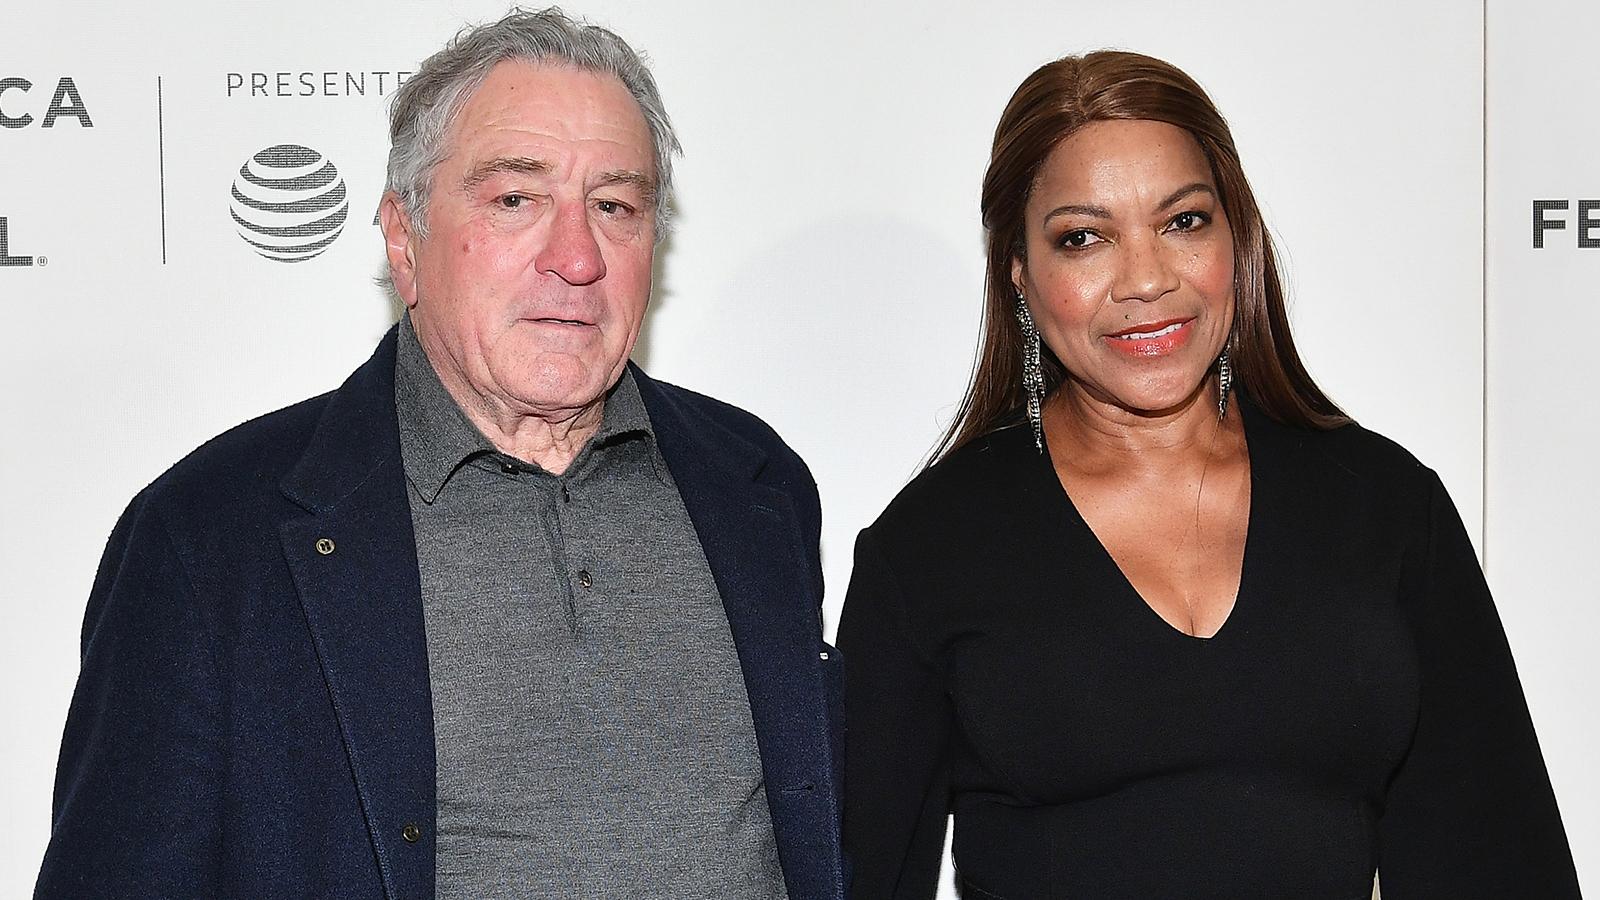 Robert De Niro Confirms Split From Grace Hightower Father's awards, salary, and net worth. robert de niro confirms split from grace hightower